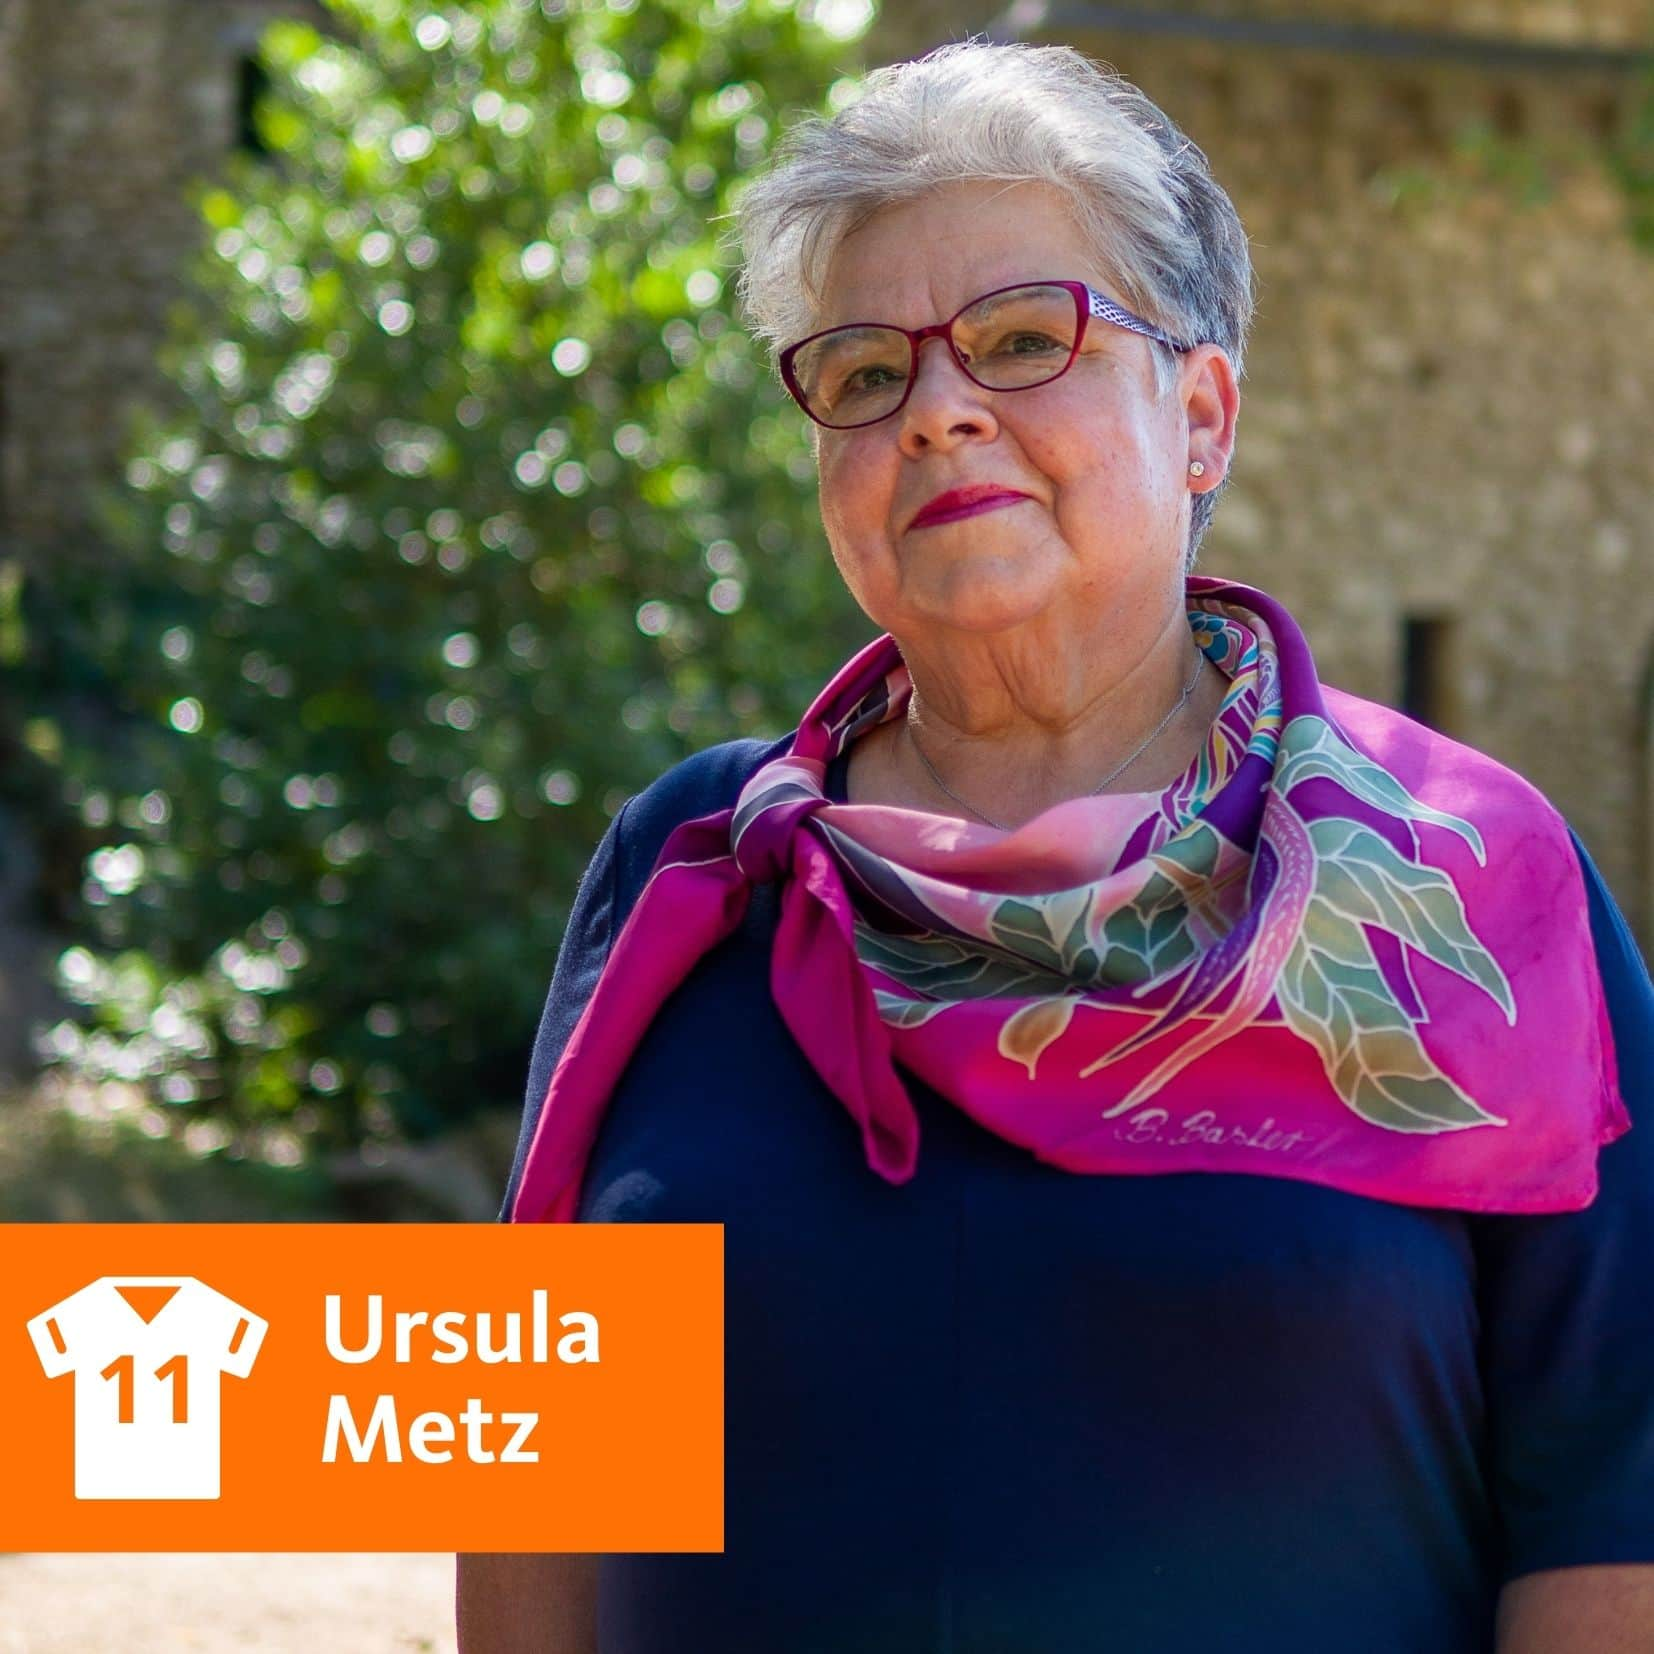 Ursula Metz